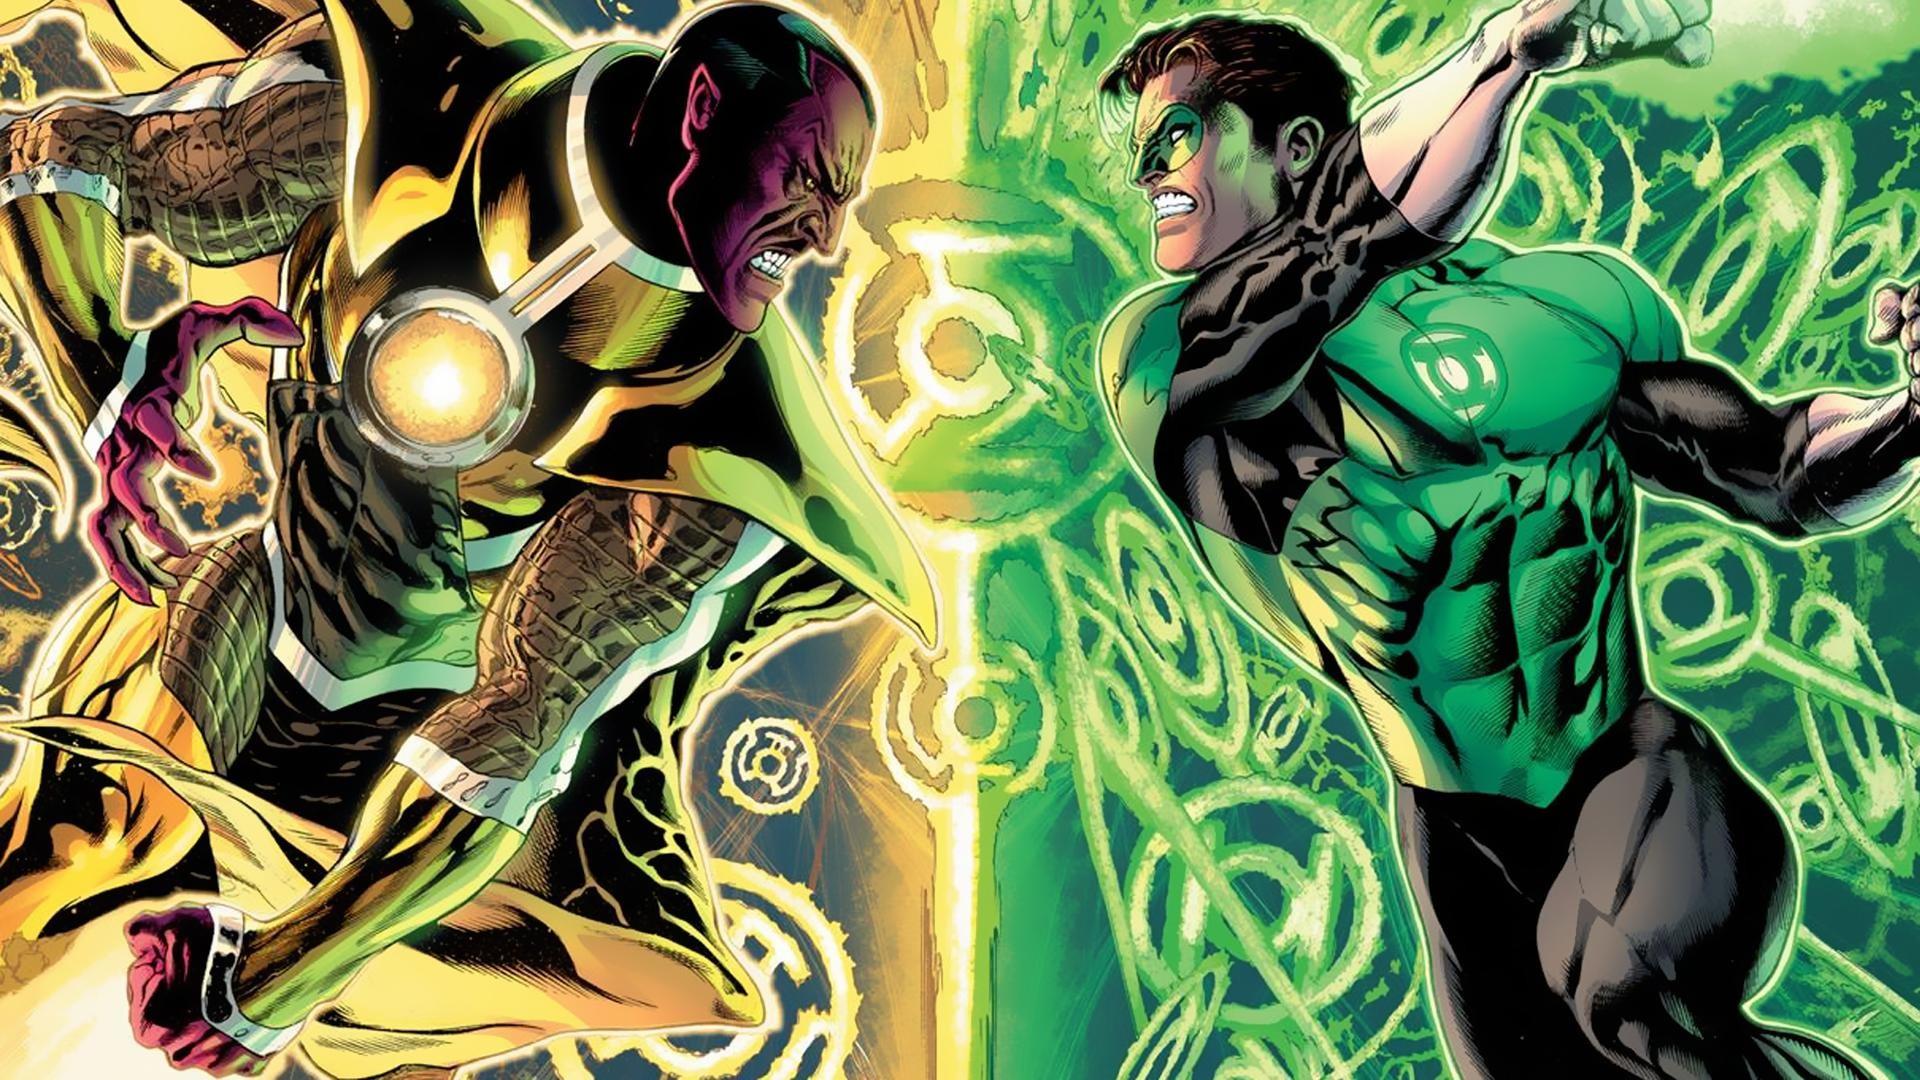 Hal Jordan vs Sinestro [1920×1080] Need #iPhone #6S #Plus #Wallpaper